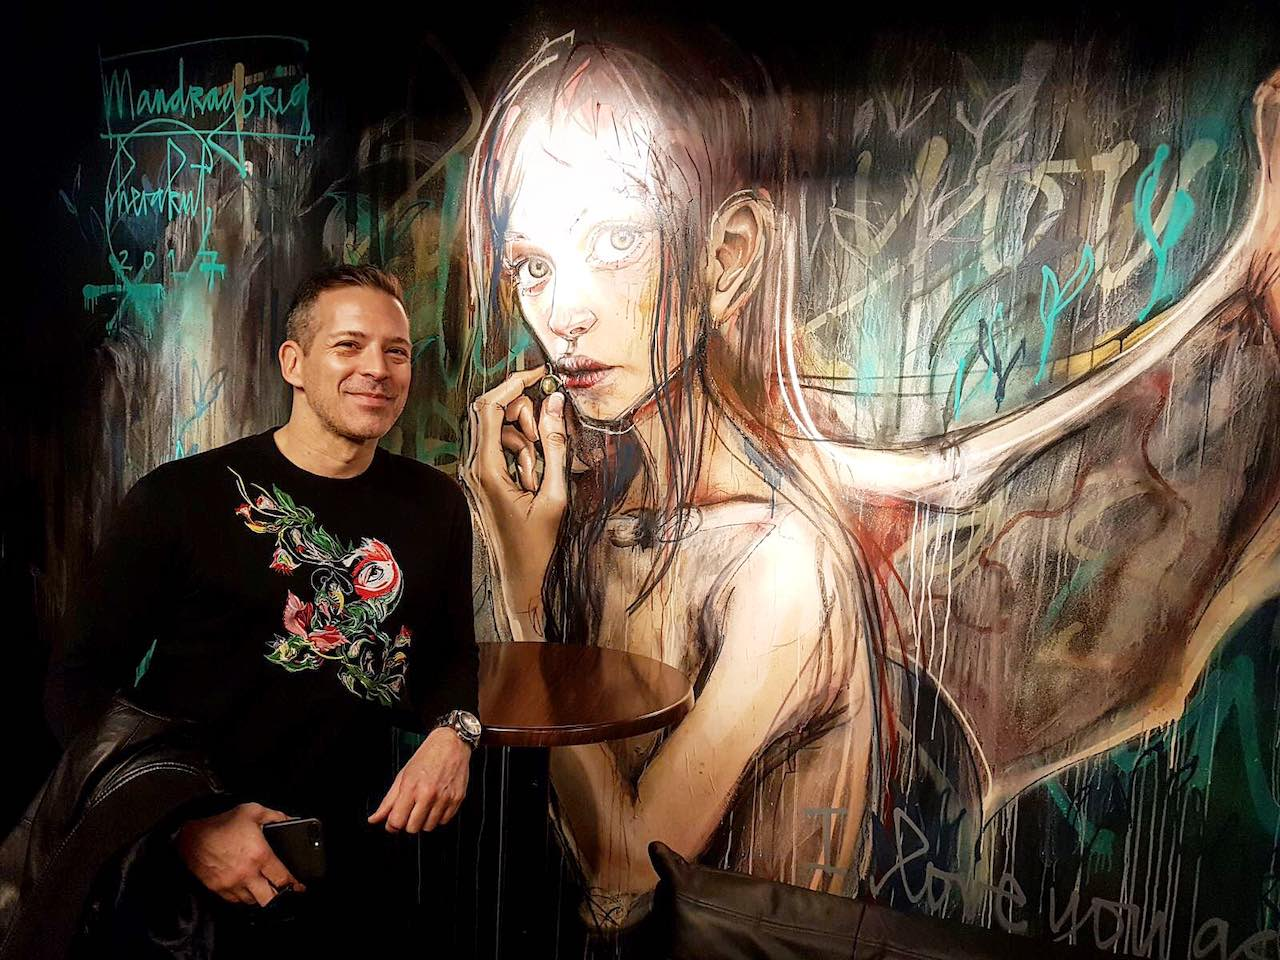 Carlos Melia in London